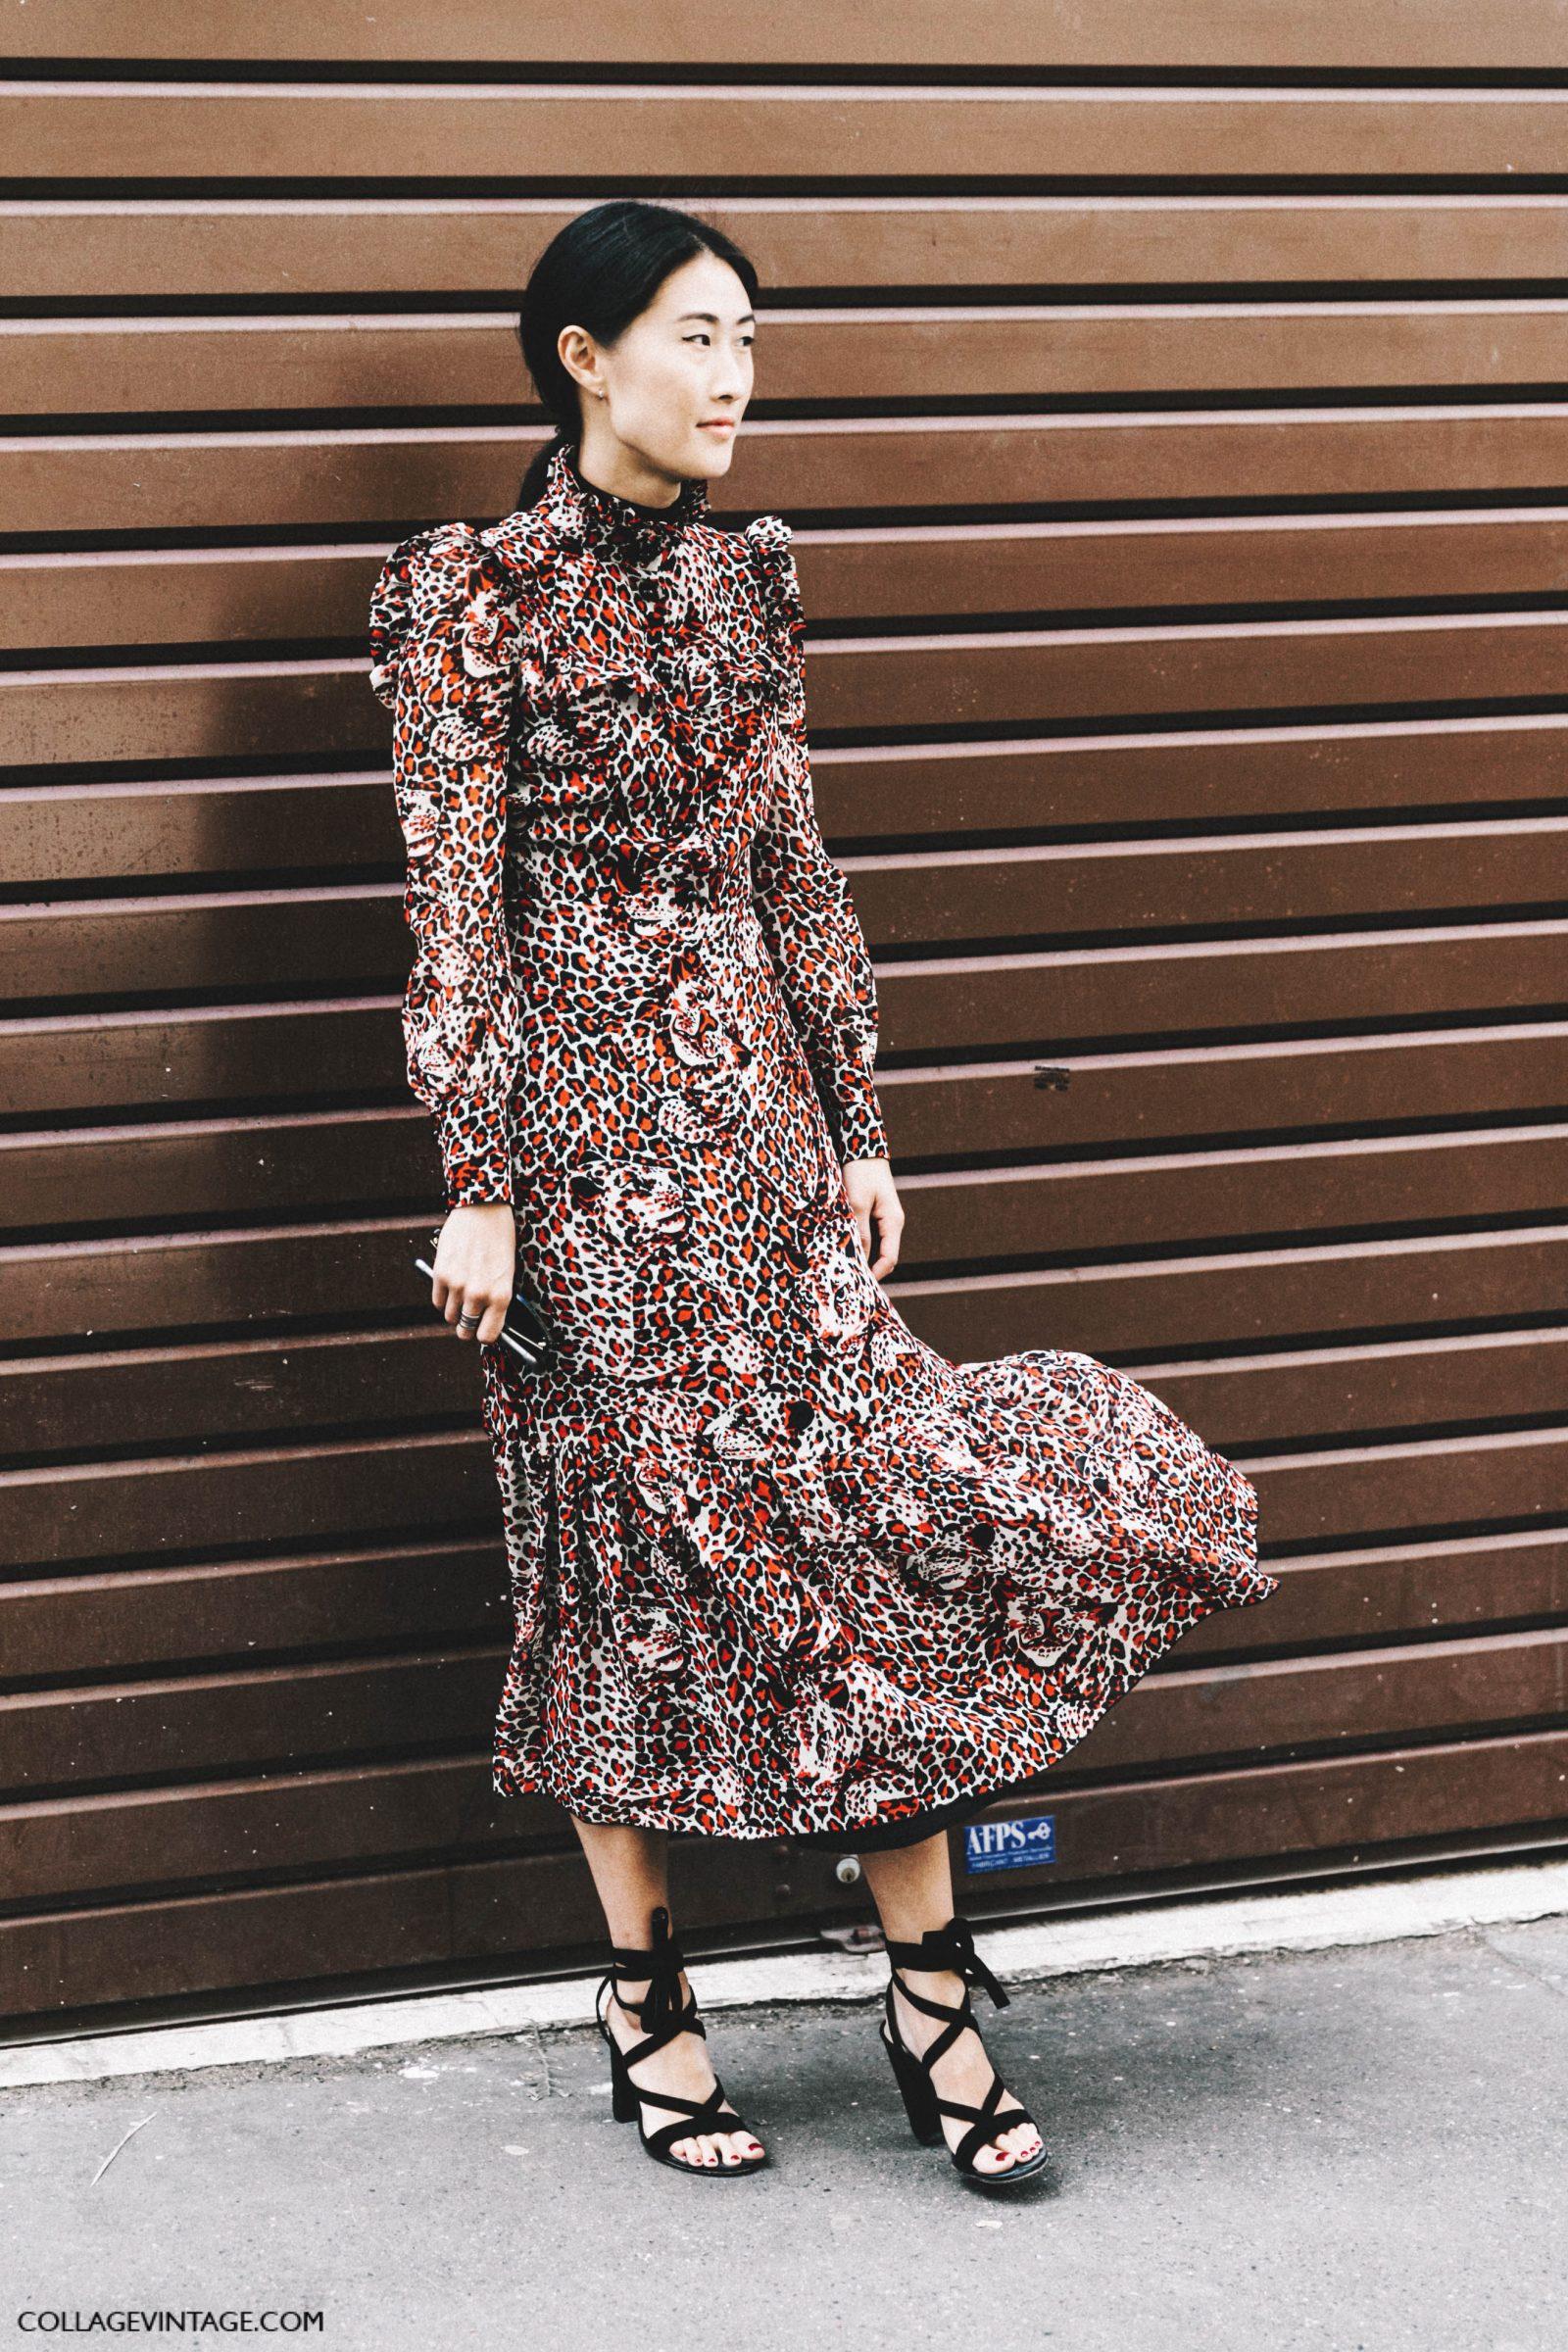 Paris_Couture_Fashion_Week-Collage_Vintage-Street_Style-68